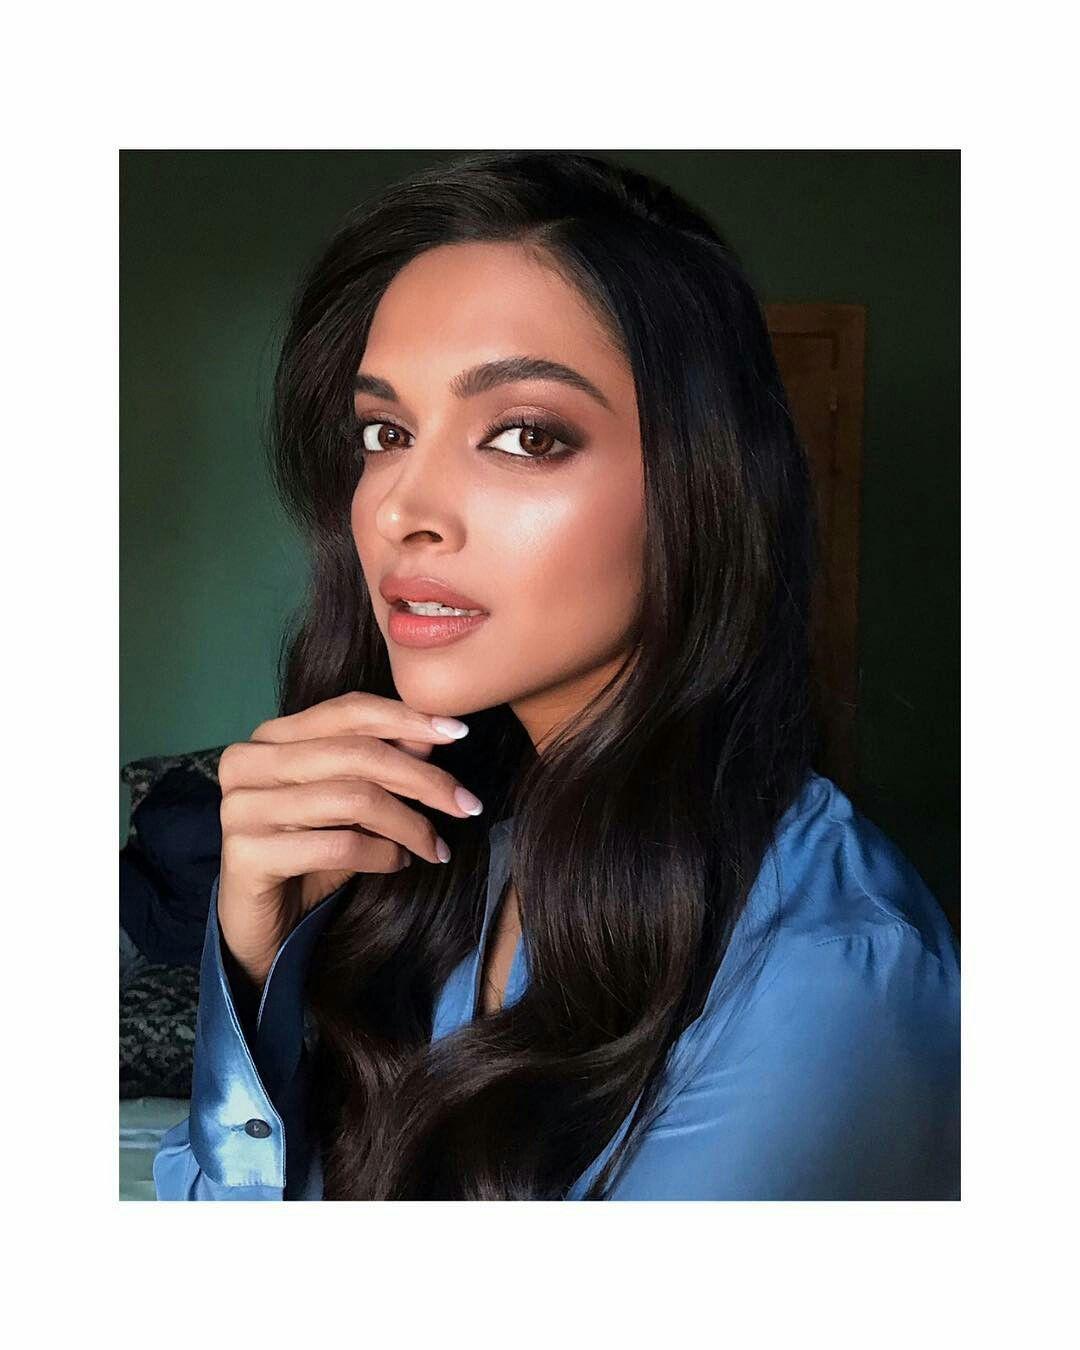 Pin by Bunny on Deepika Padukone (Deepu) | Beauty eyebrow ...